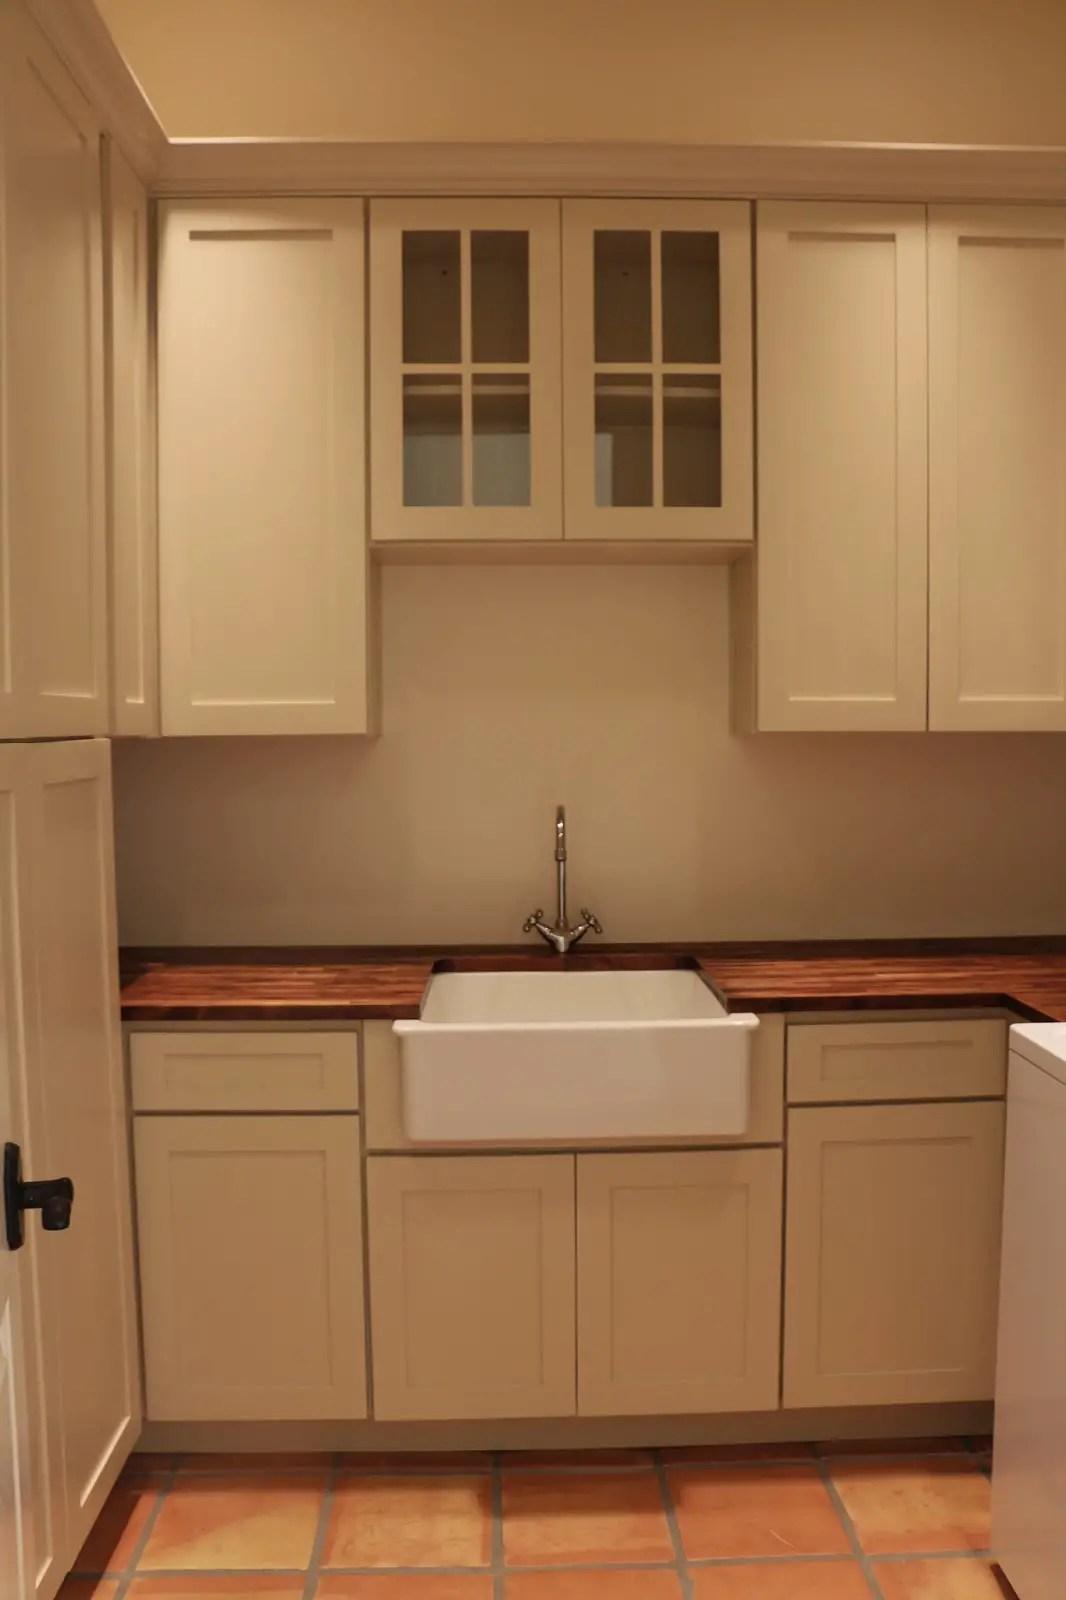 Modern Rustic Kitchen Decor